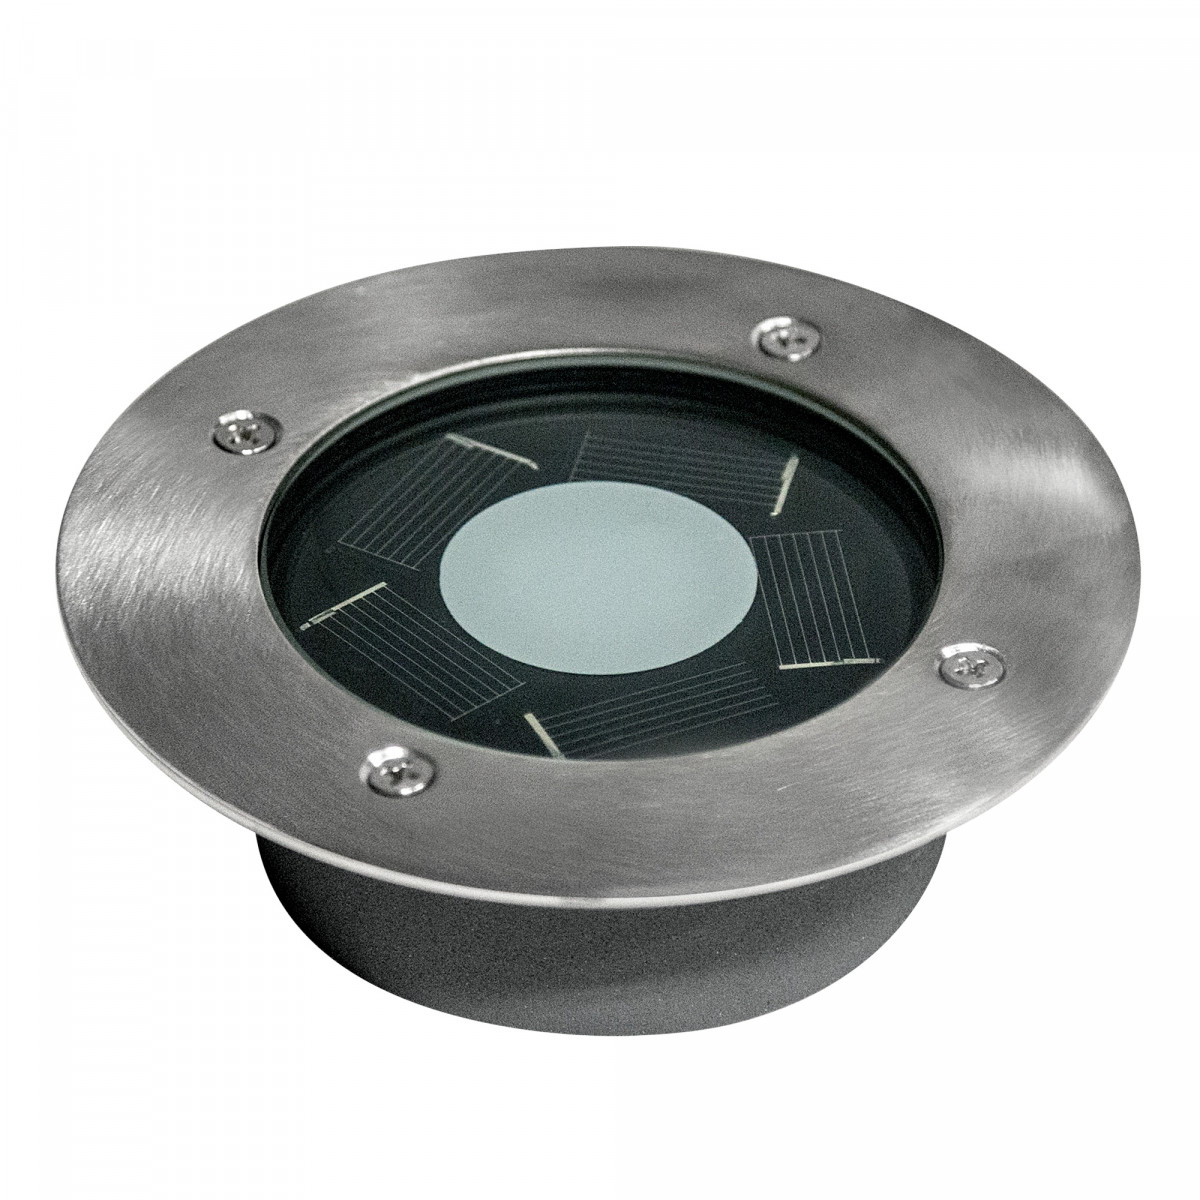 grondspot - LED solar Grondspot Rond Puck solar - solarlamp - zonne energie spot - Nostalux